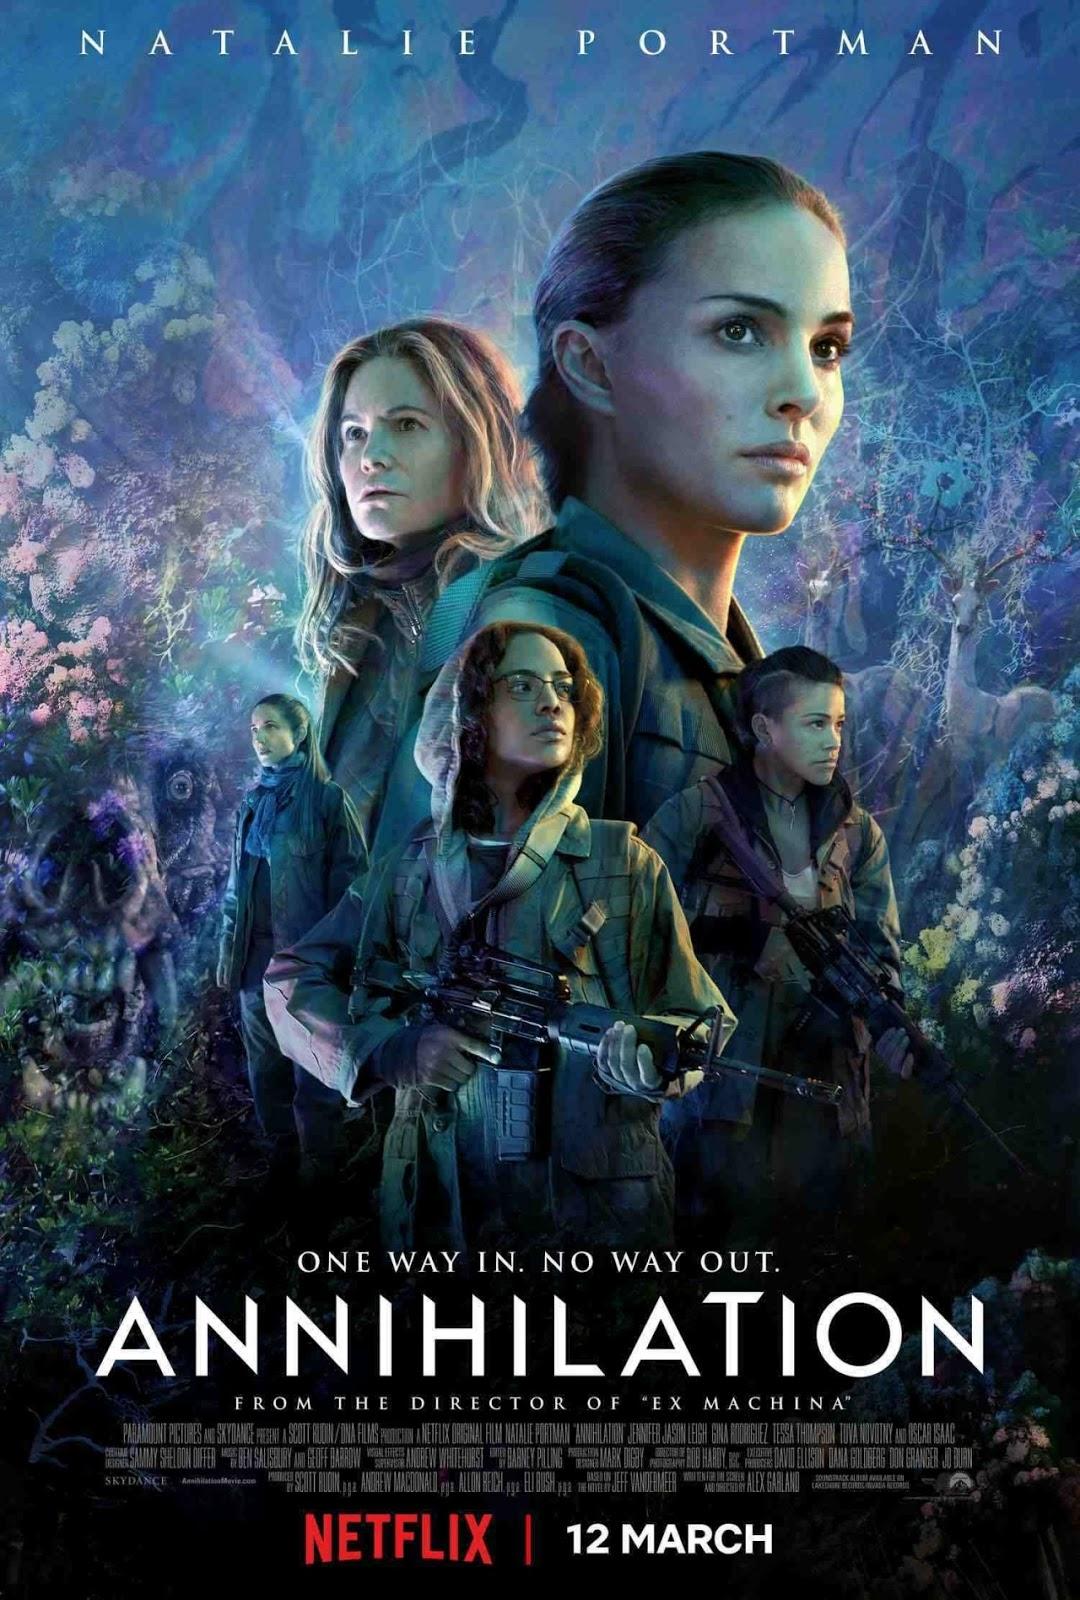 Annihilation (2018) แดนทำลายล้าง (ซับไทย Netflix)